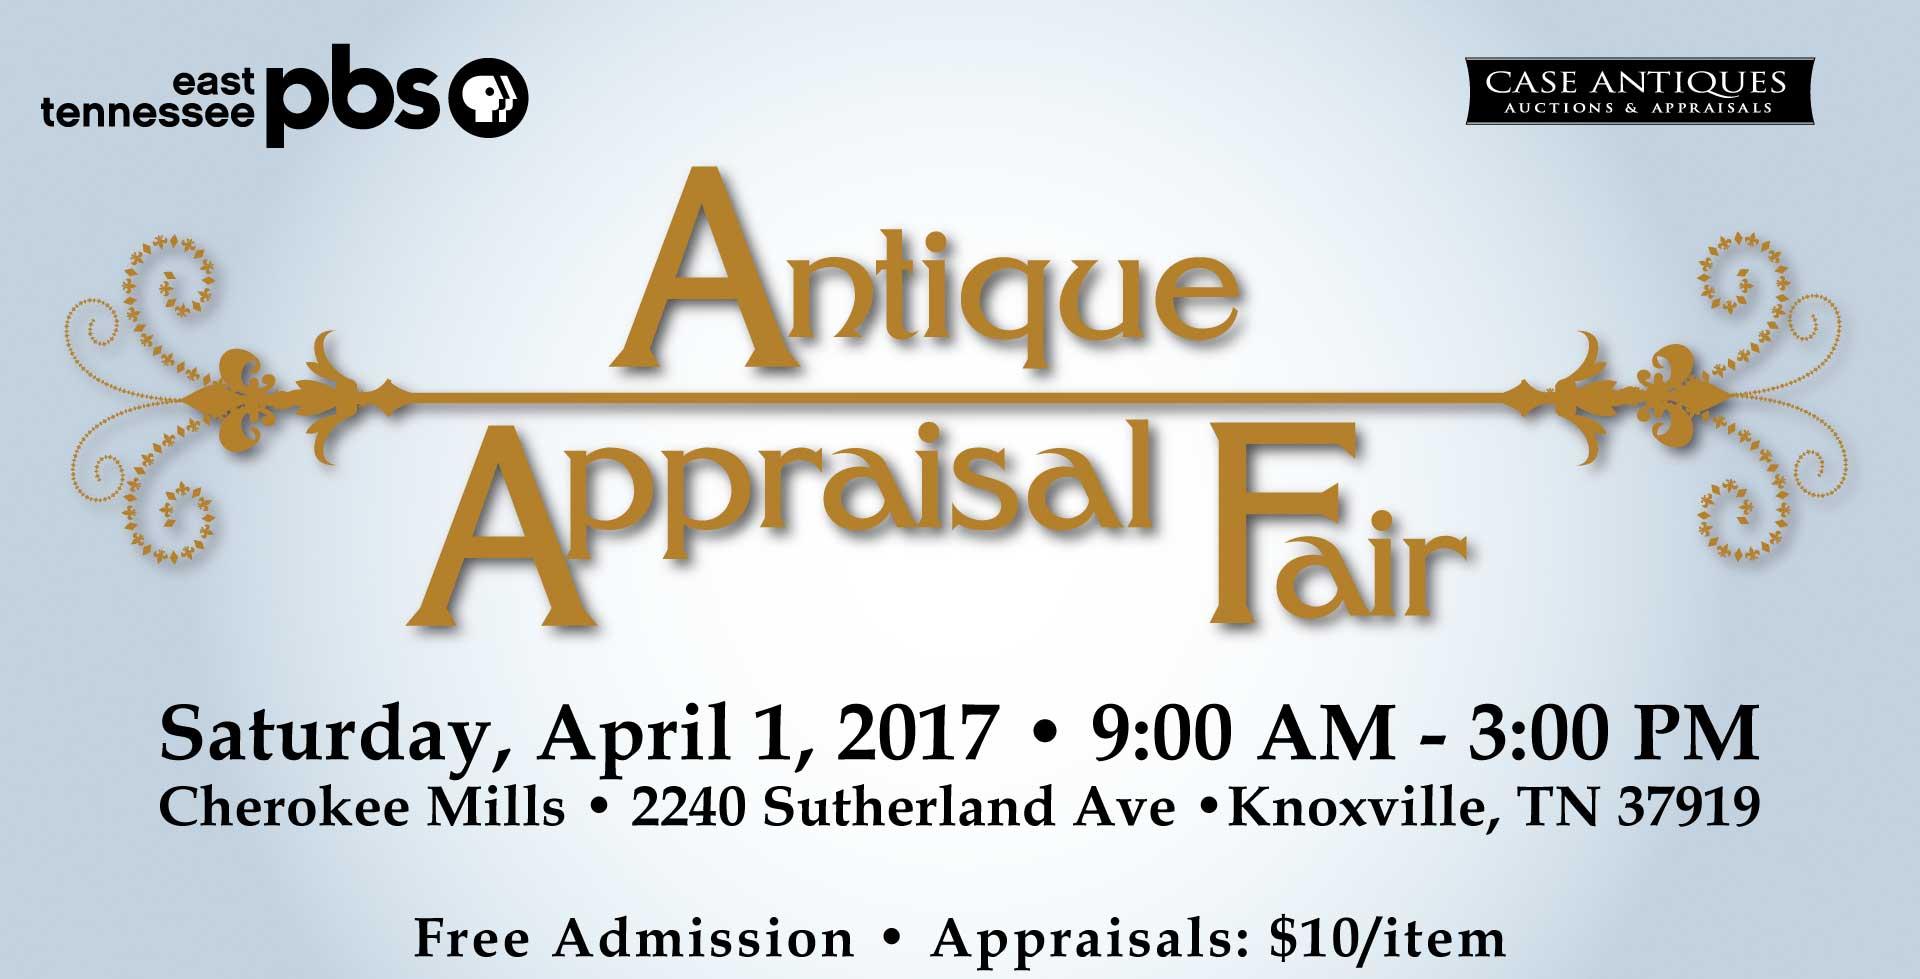 Join us for the Antique & Appraisal Fair - April 1, 2017